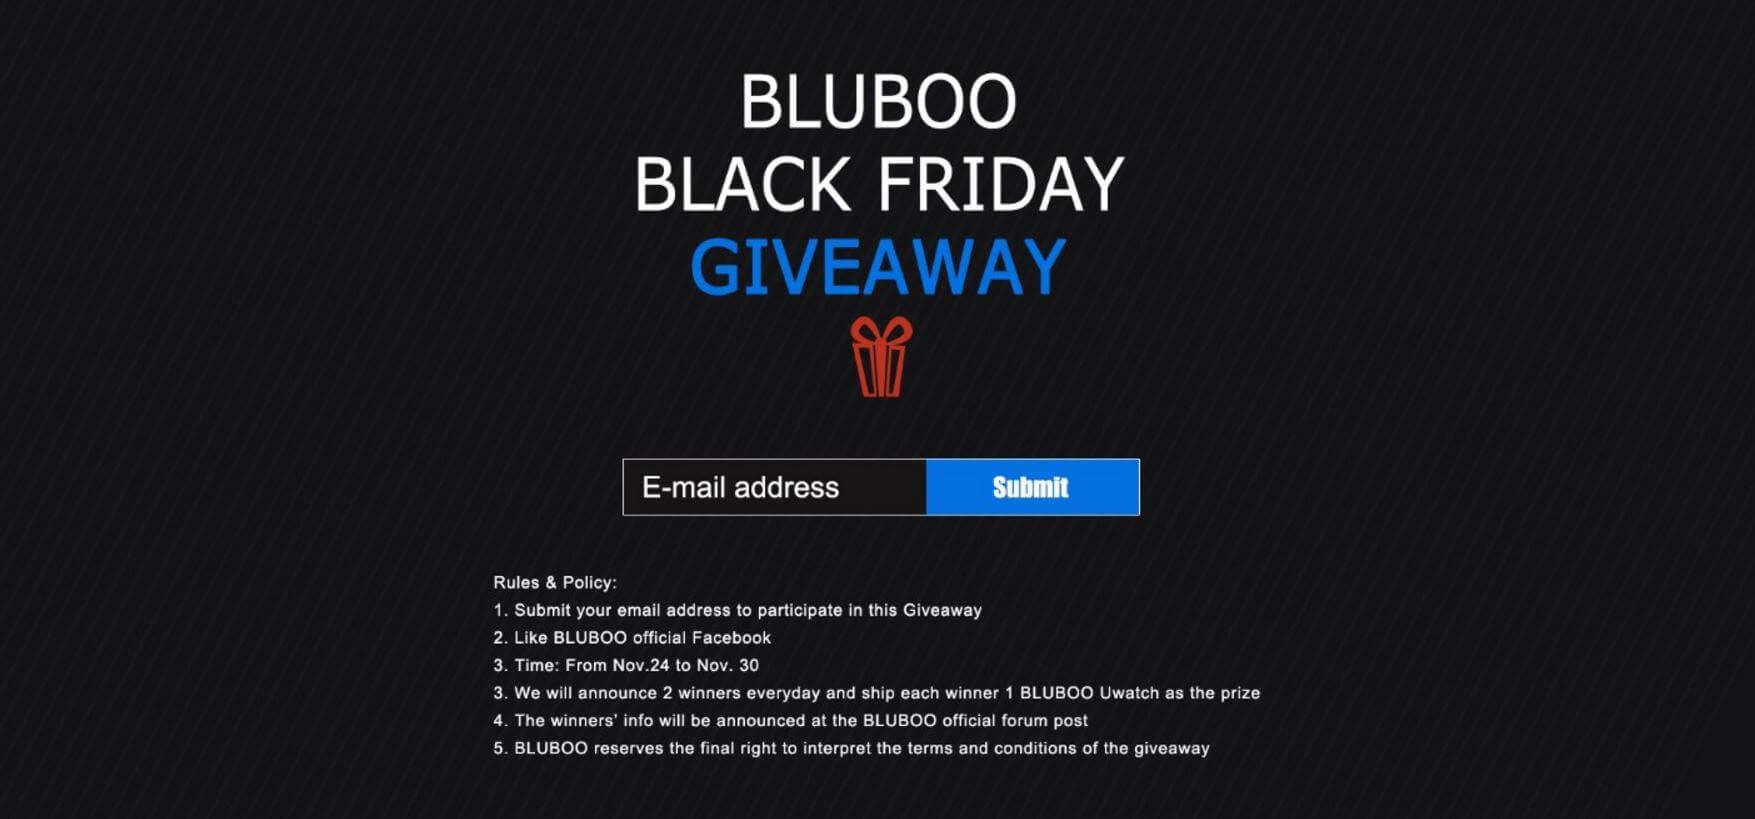 Bluboo Black Friday Giveaway